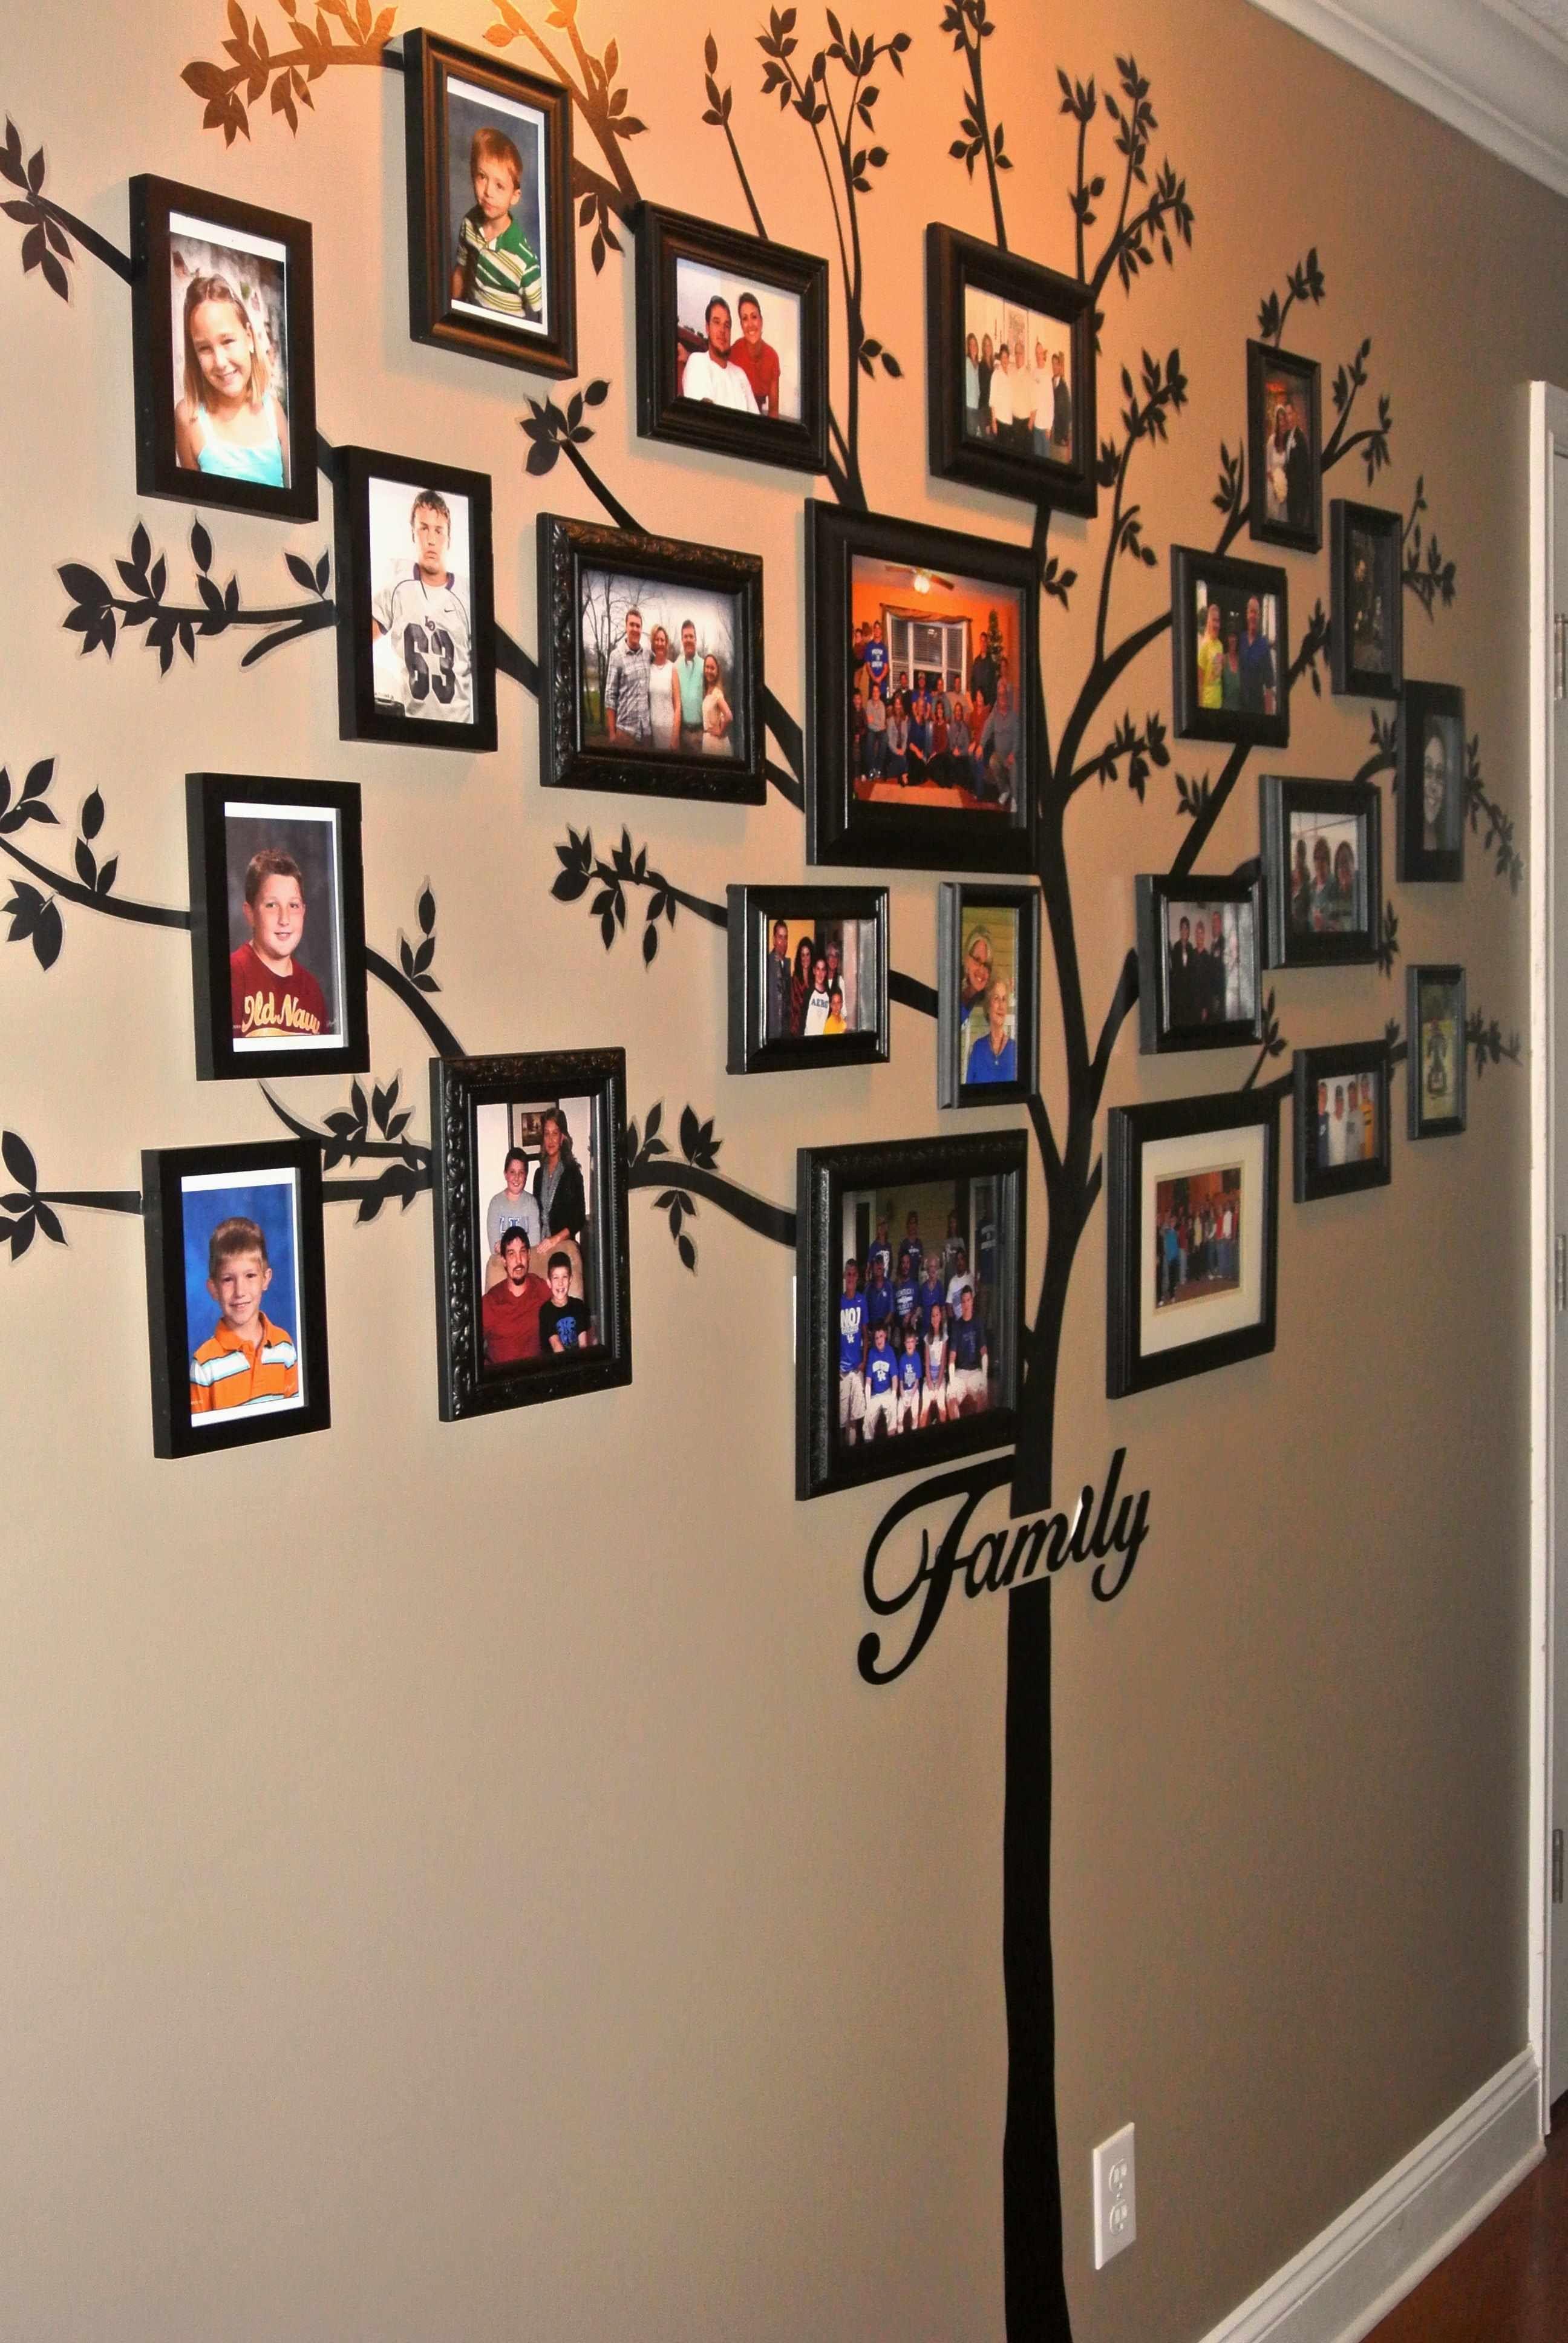 Pin By Ranasays On Myhomelogue In 2020 Family Tree Wall Decor